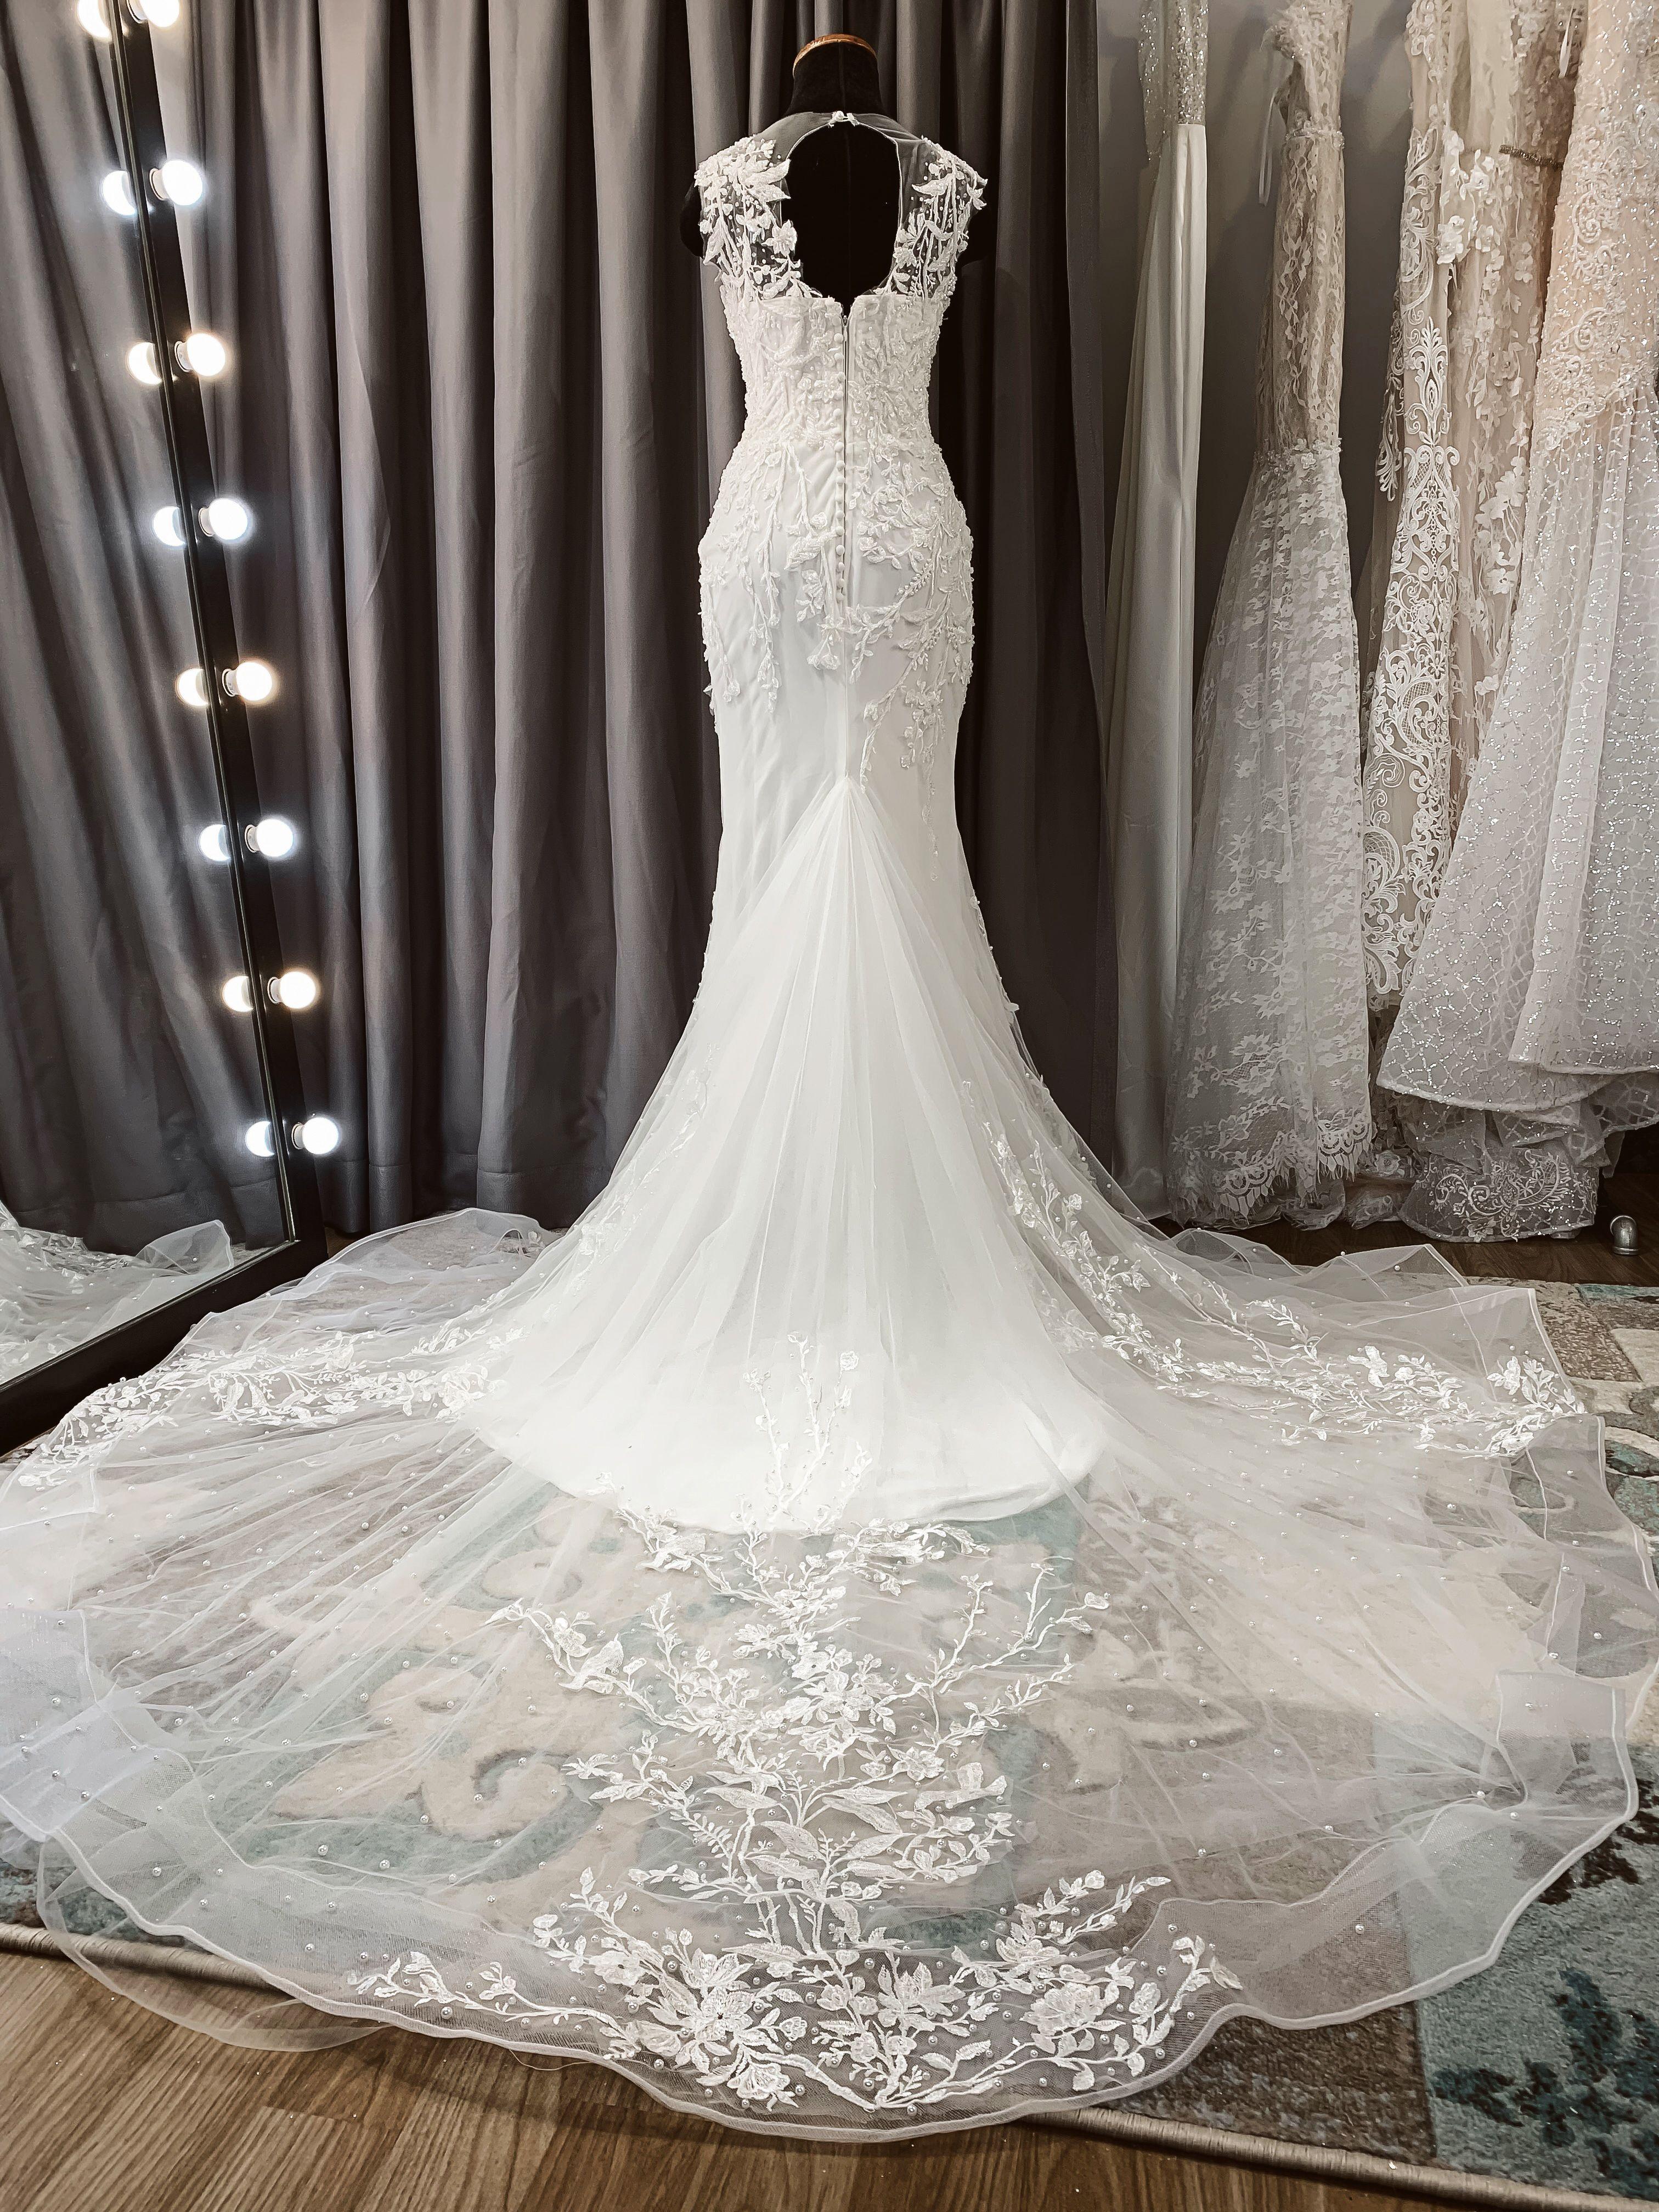 Long Train Bridal Dress Sleeveless Mermaid Wedding Gown With Keyhole Back Wedding Gowns Mermaid Bridal Gowns Mermaid Wedding Dresses [ 4032 x 3024 Pixel ]